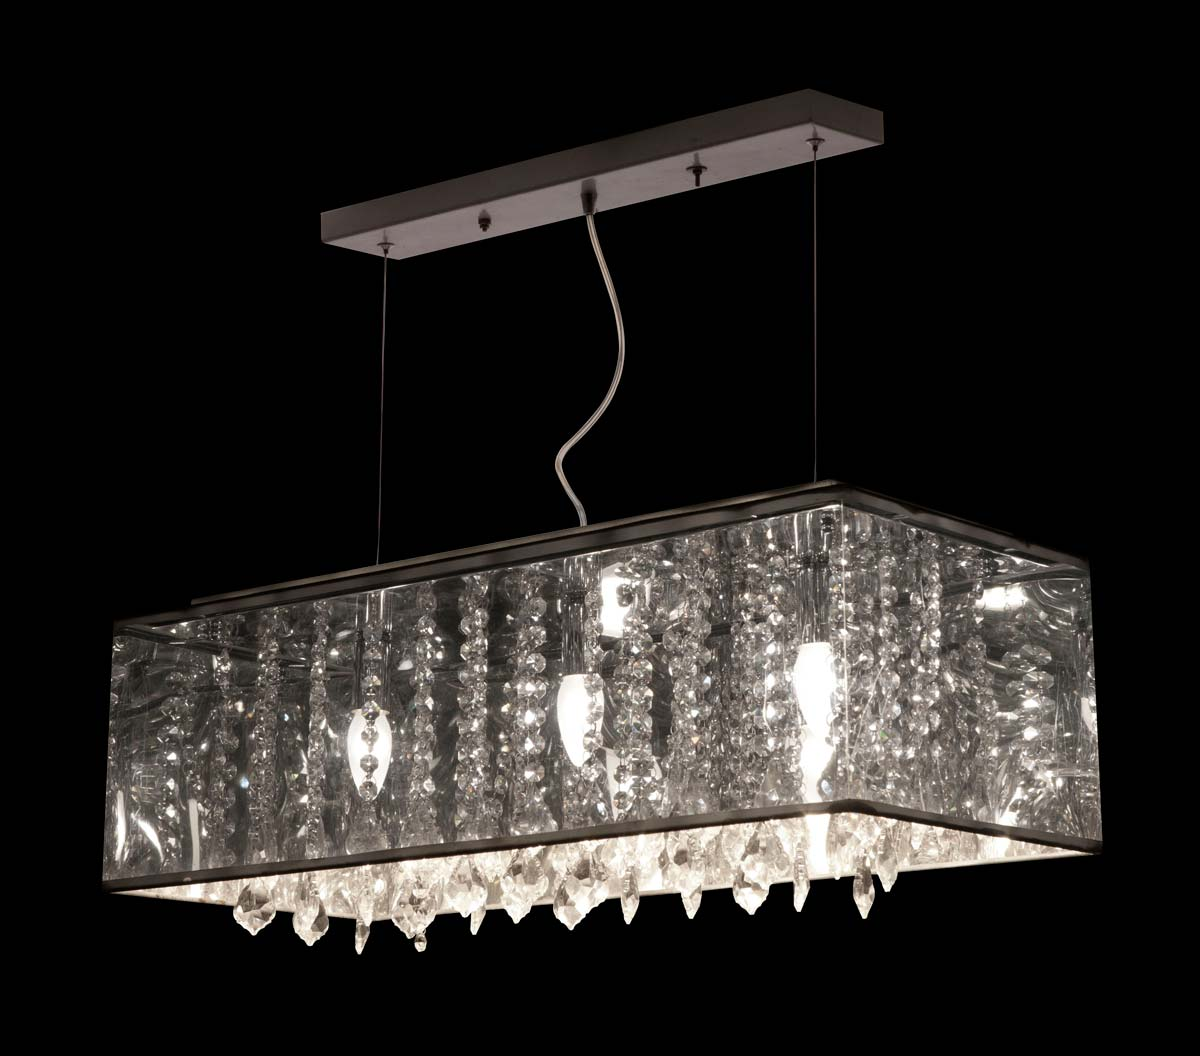 Zuo Modern Blast Ceiling Lamp - Translucent